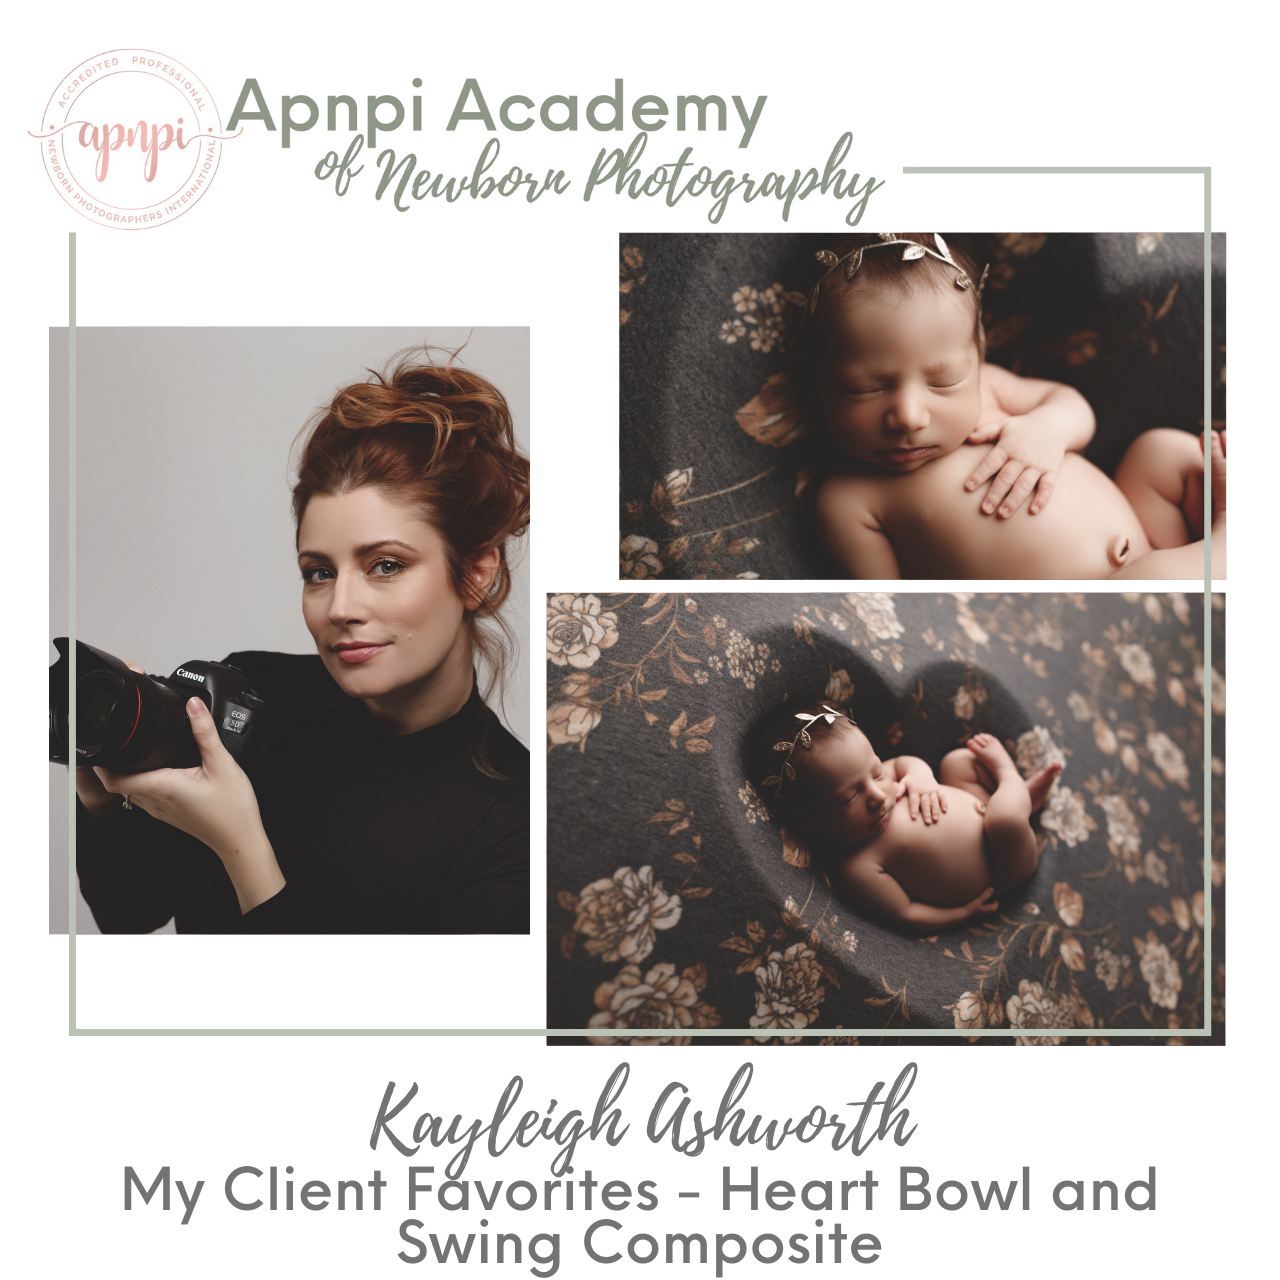 Kayleigh Ashworth Newborn Photography Heart Bowl and Swing Composite APNPI Academy Course